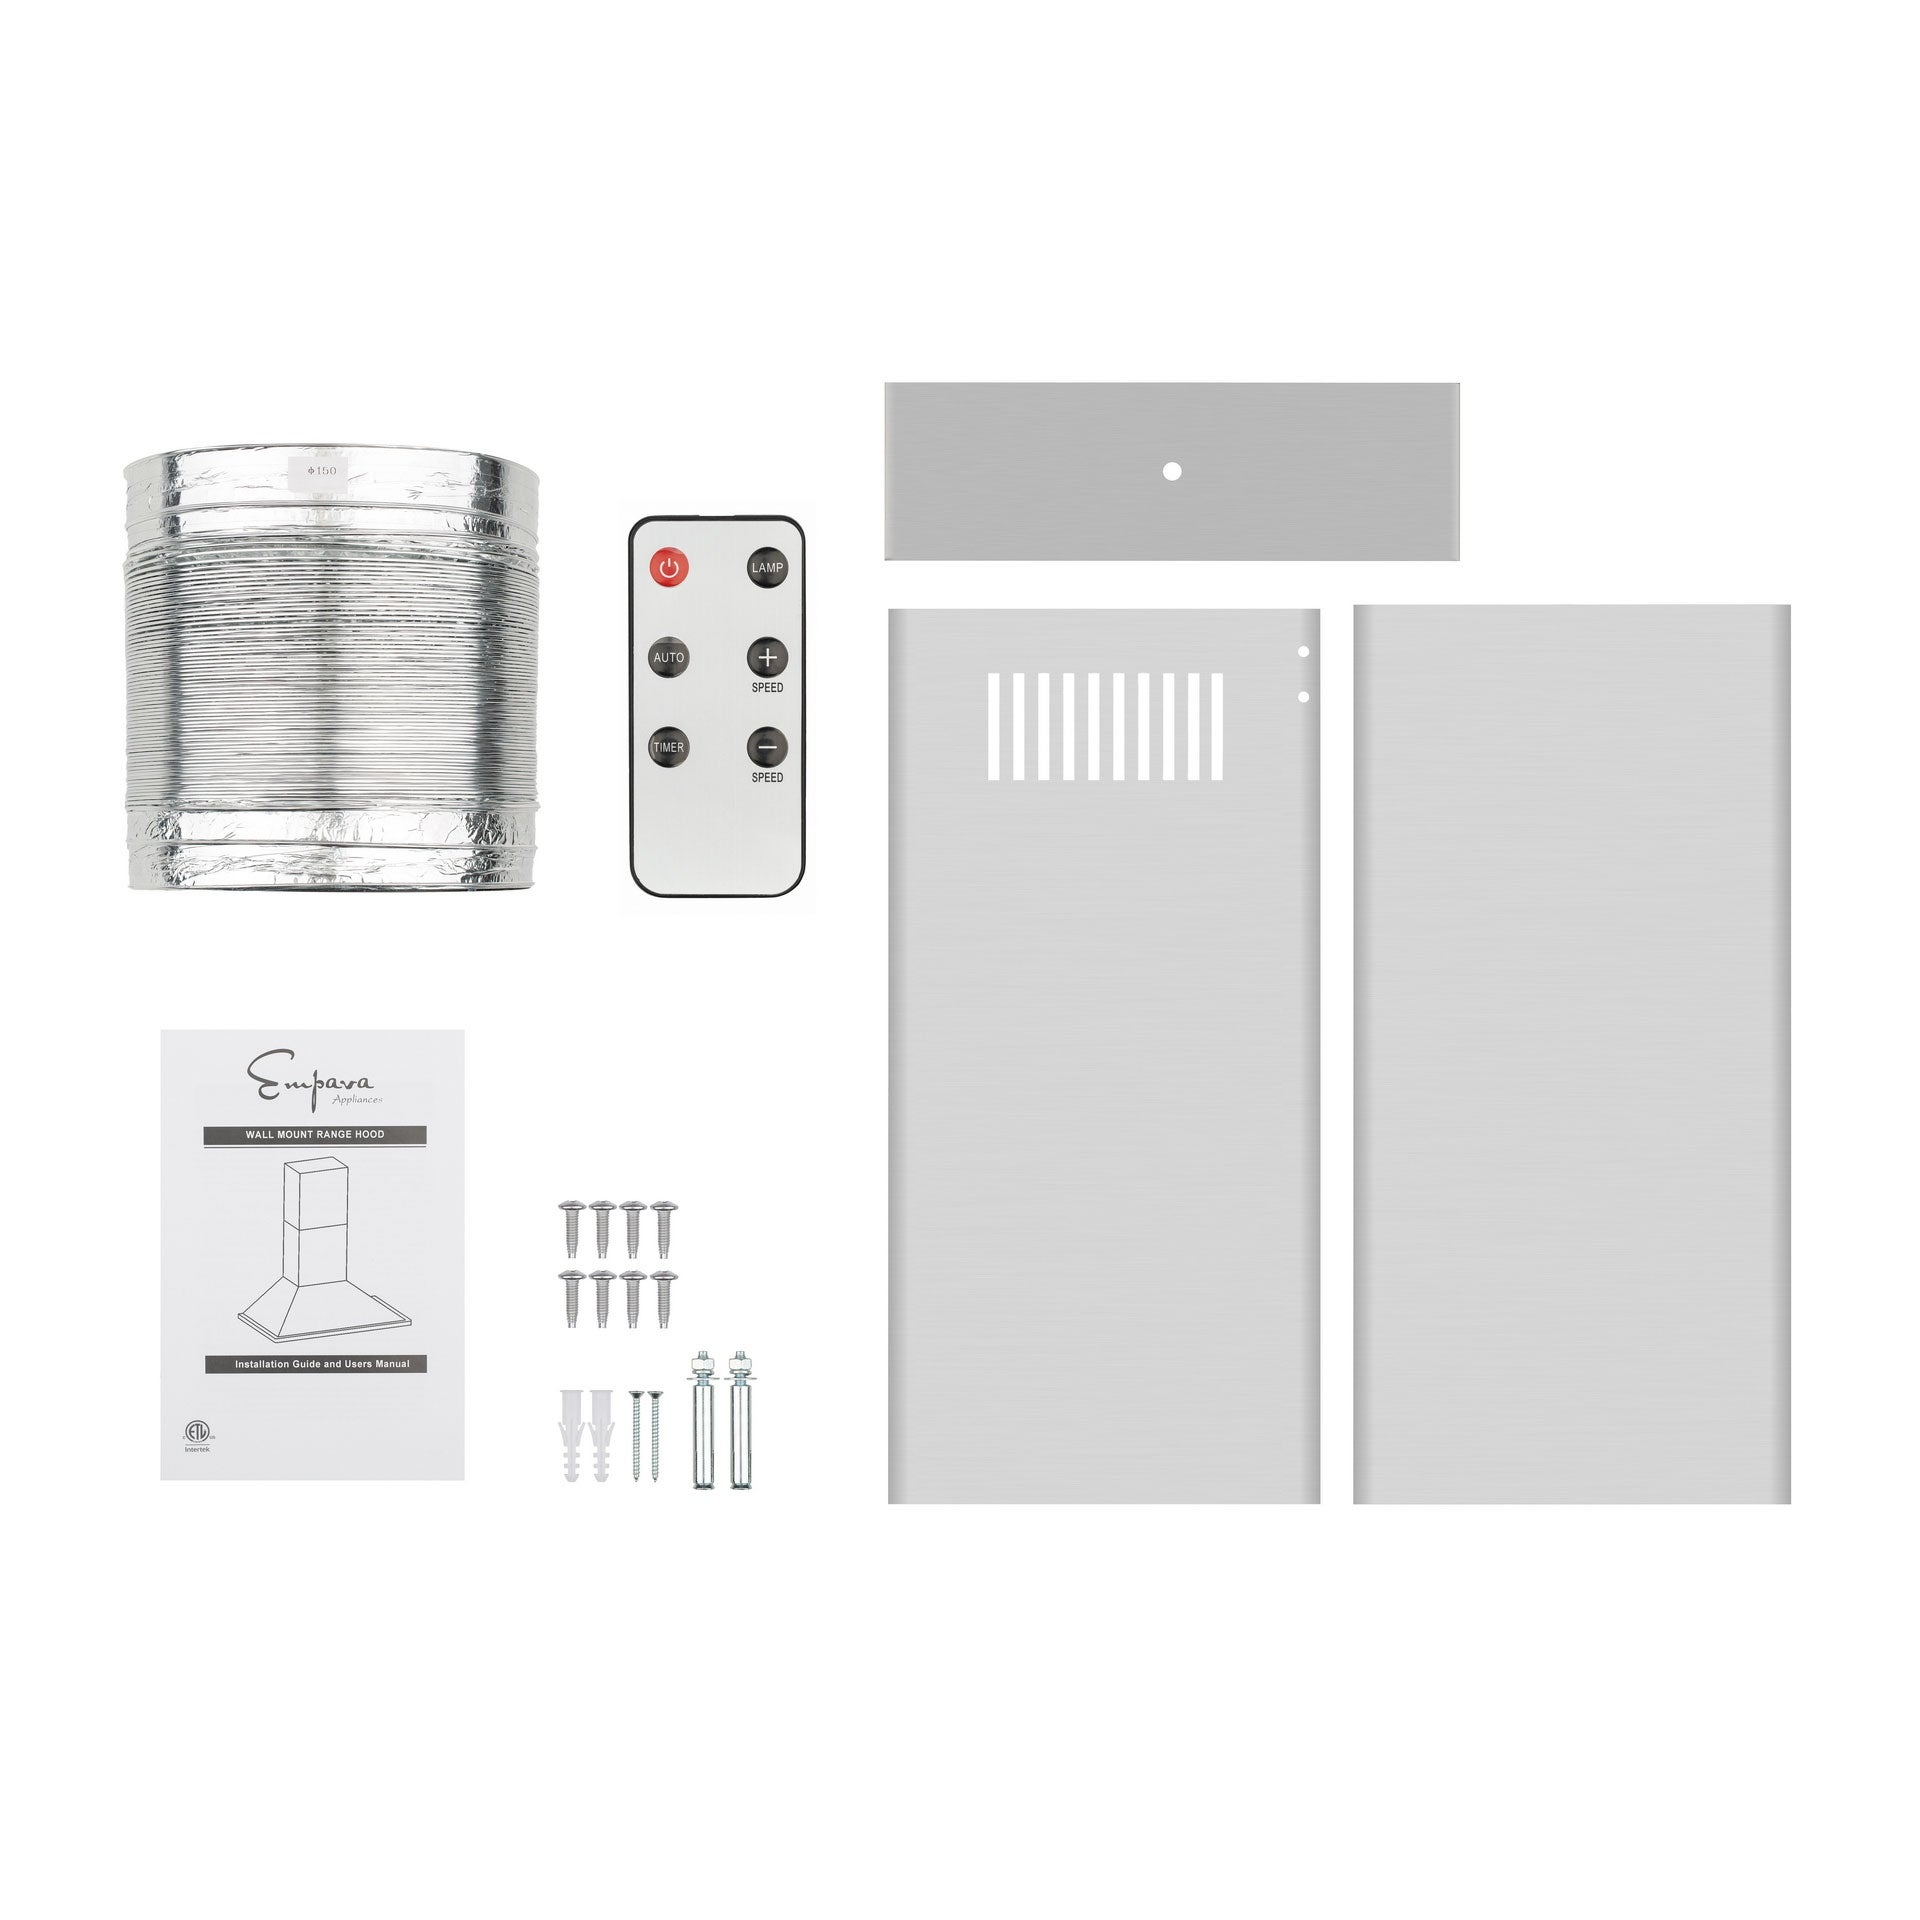 Range Hoods Appliances Empava 30 in silver 380 CFM Wall Mount ...